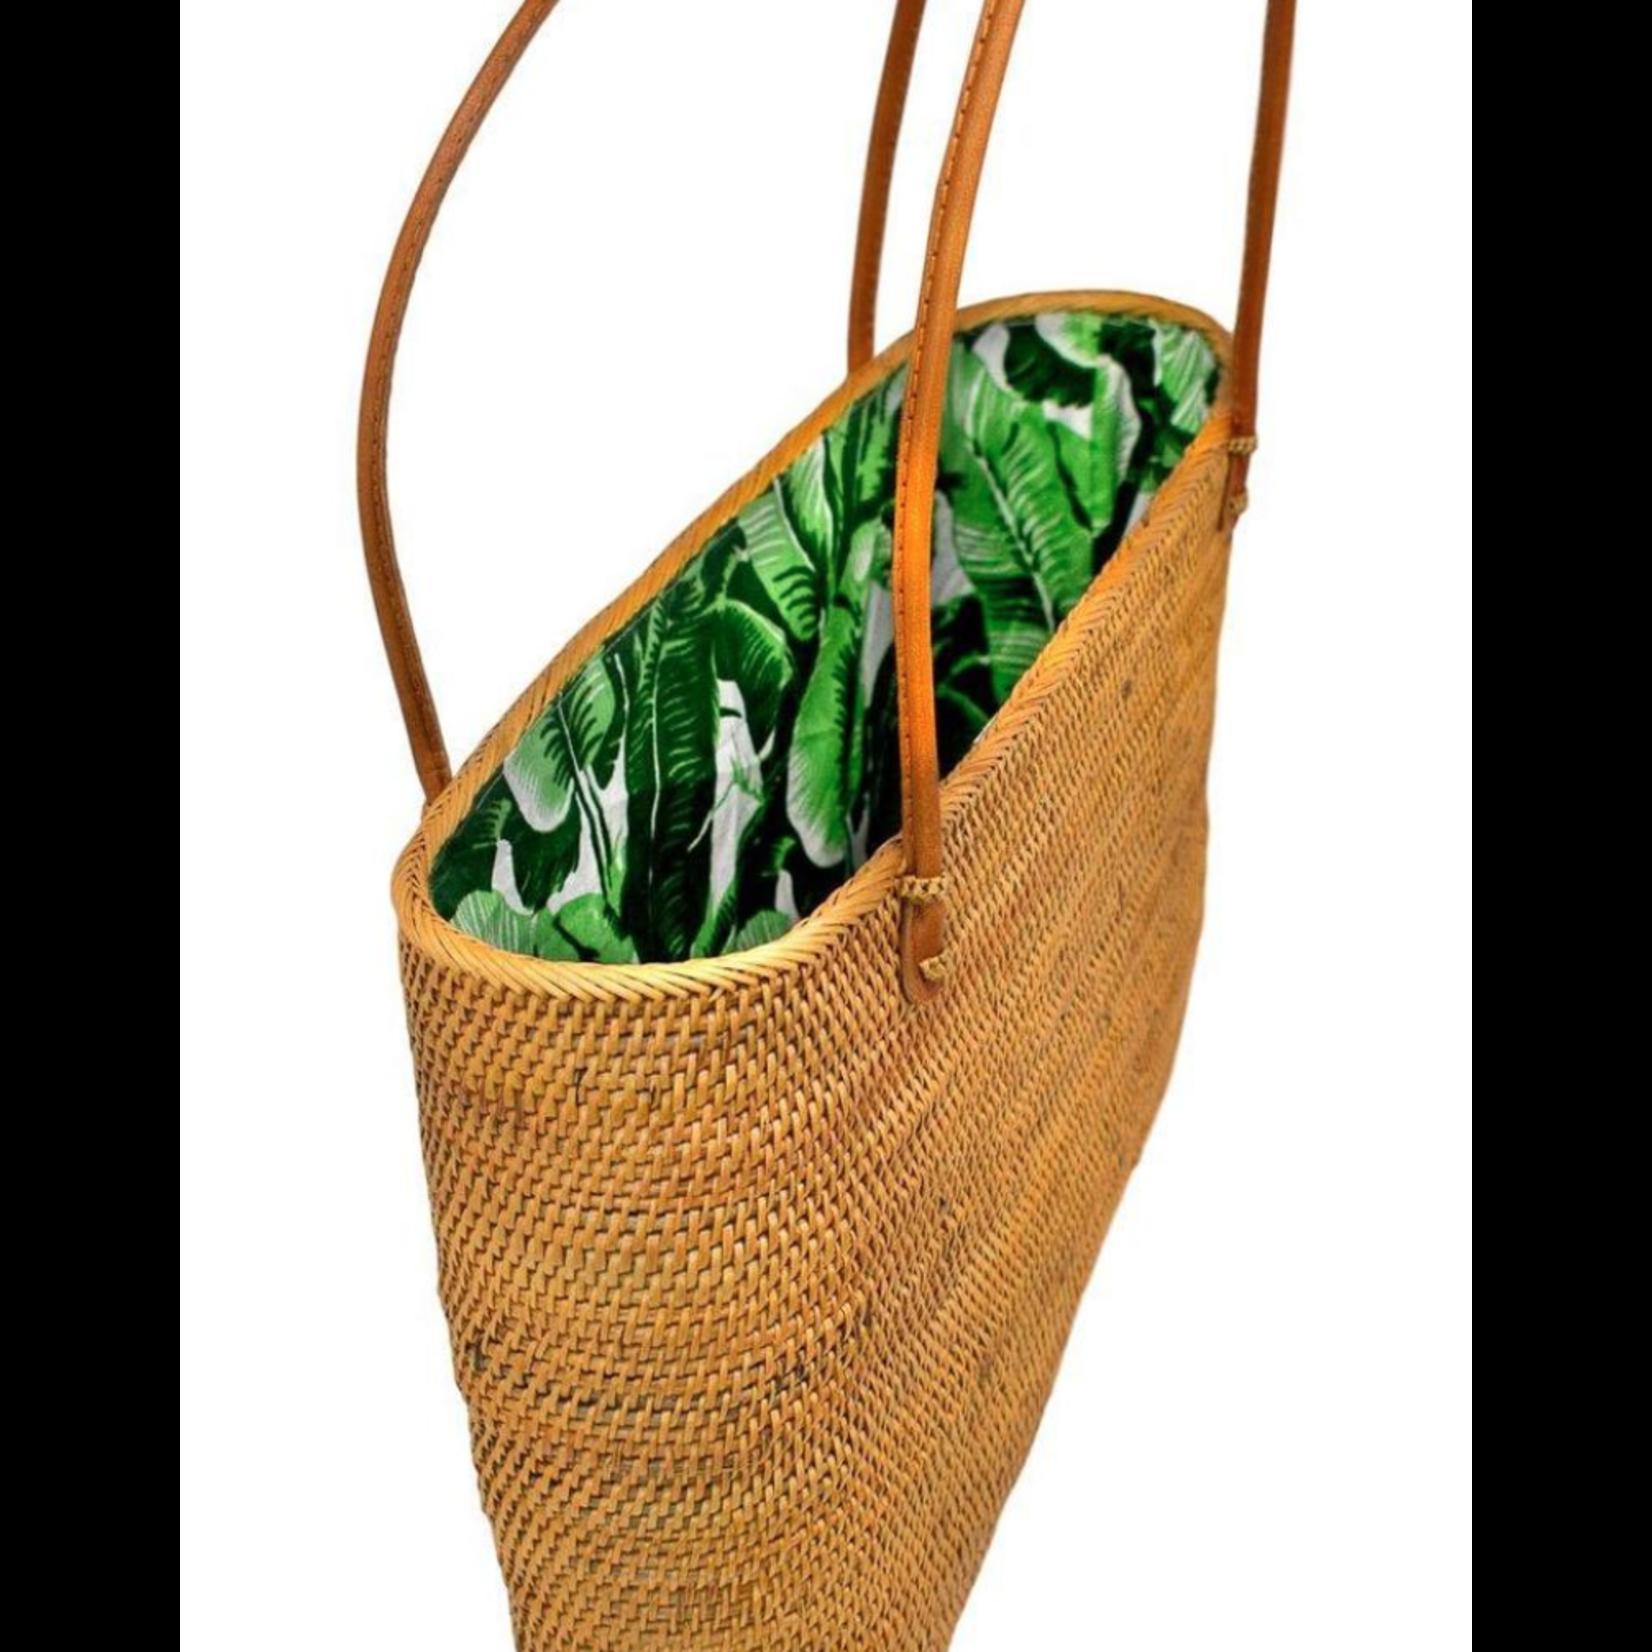 Poppy + Sage Harper Tote - Palm Leaf